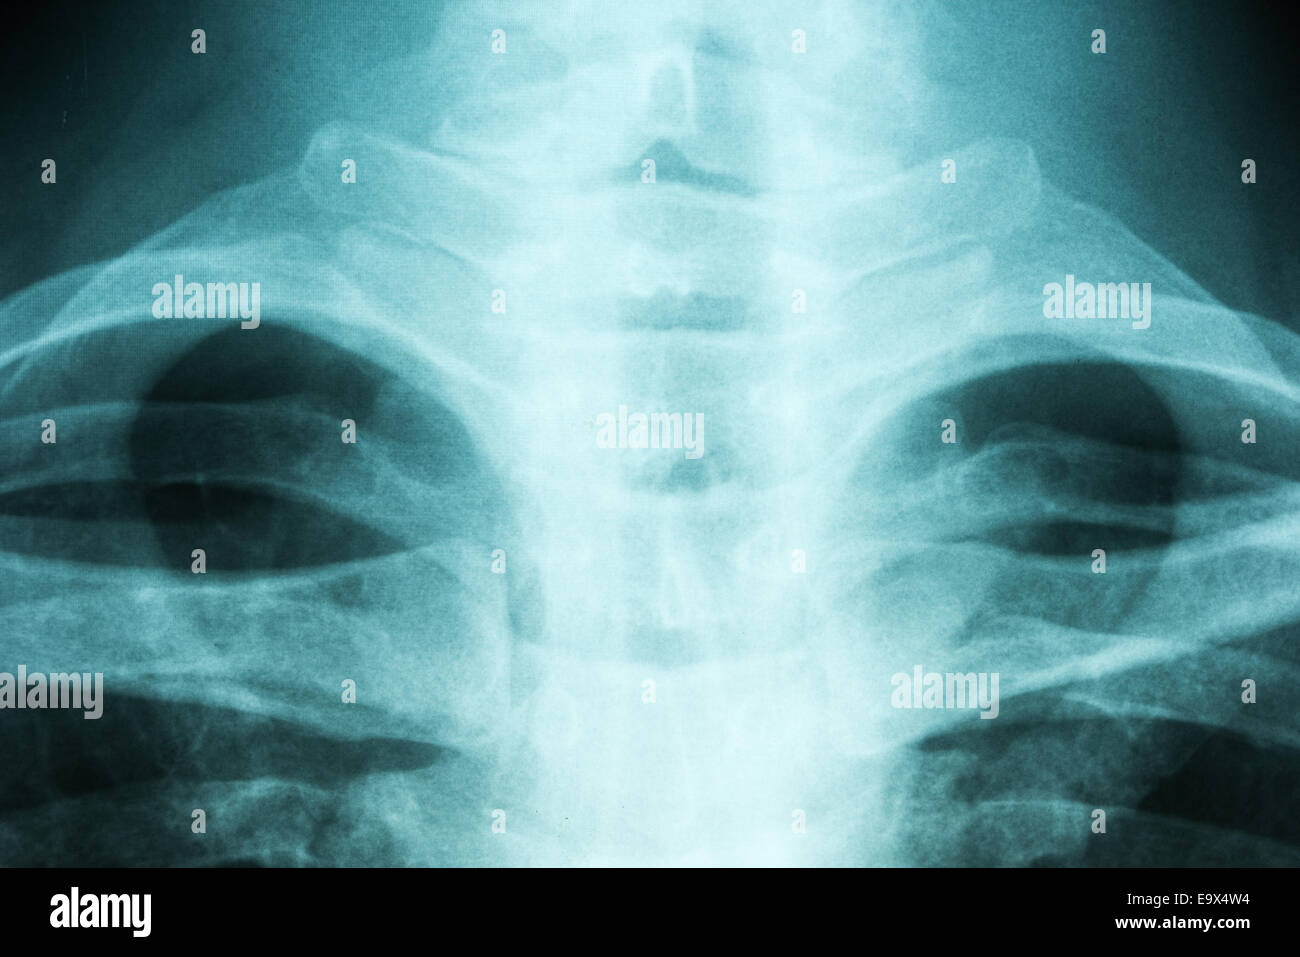 Medical X-Ray Of Thoracic Vertebral Column - Stock Image